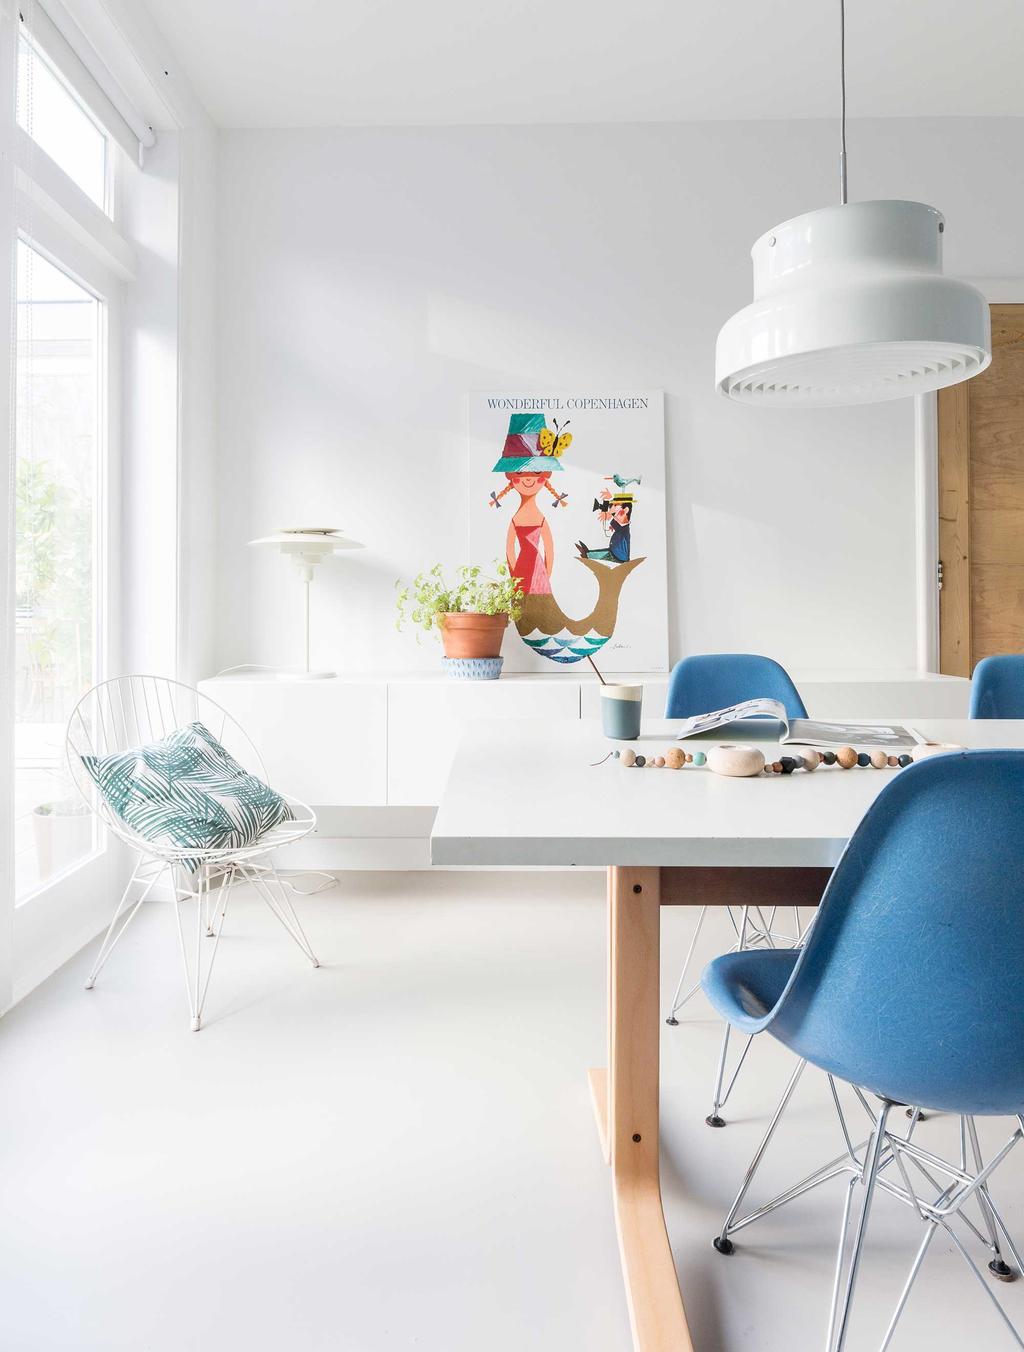 blauwe stoelen